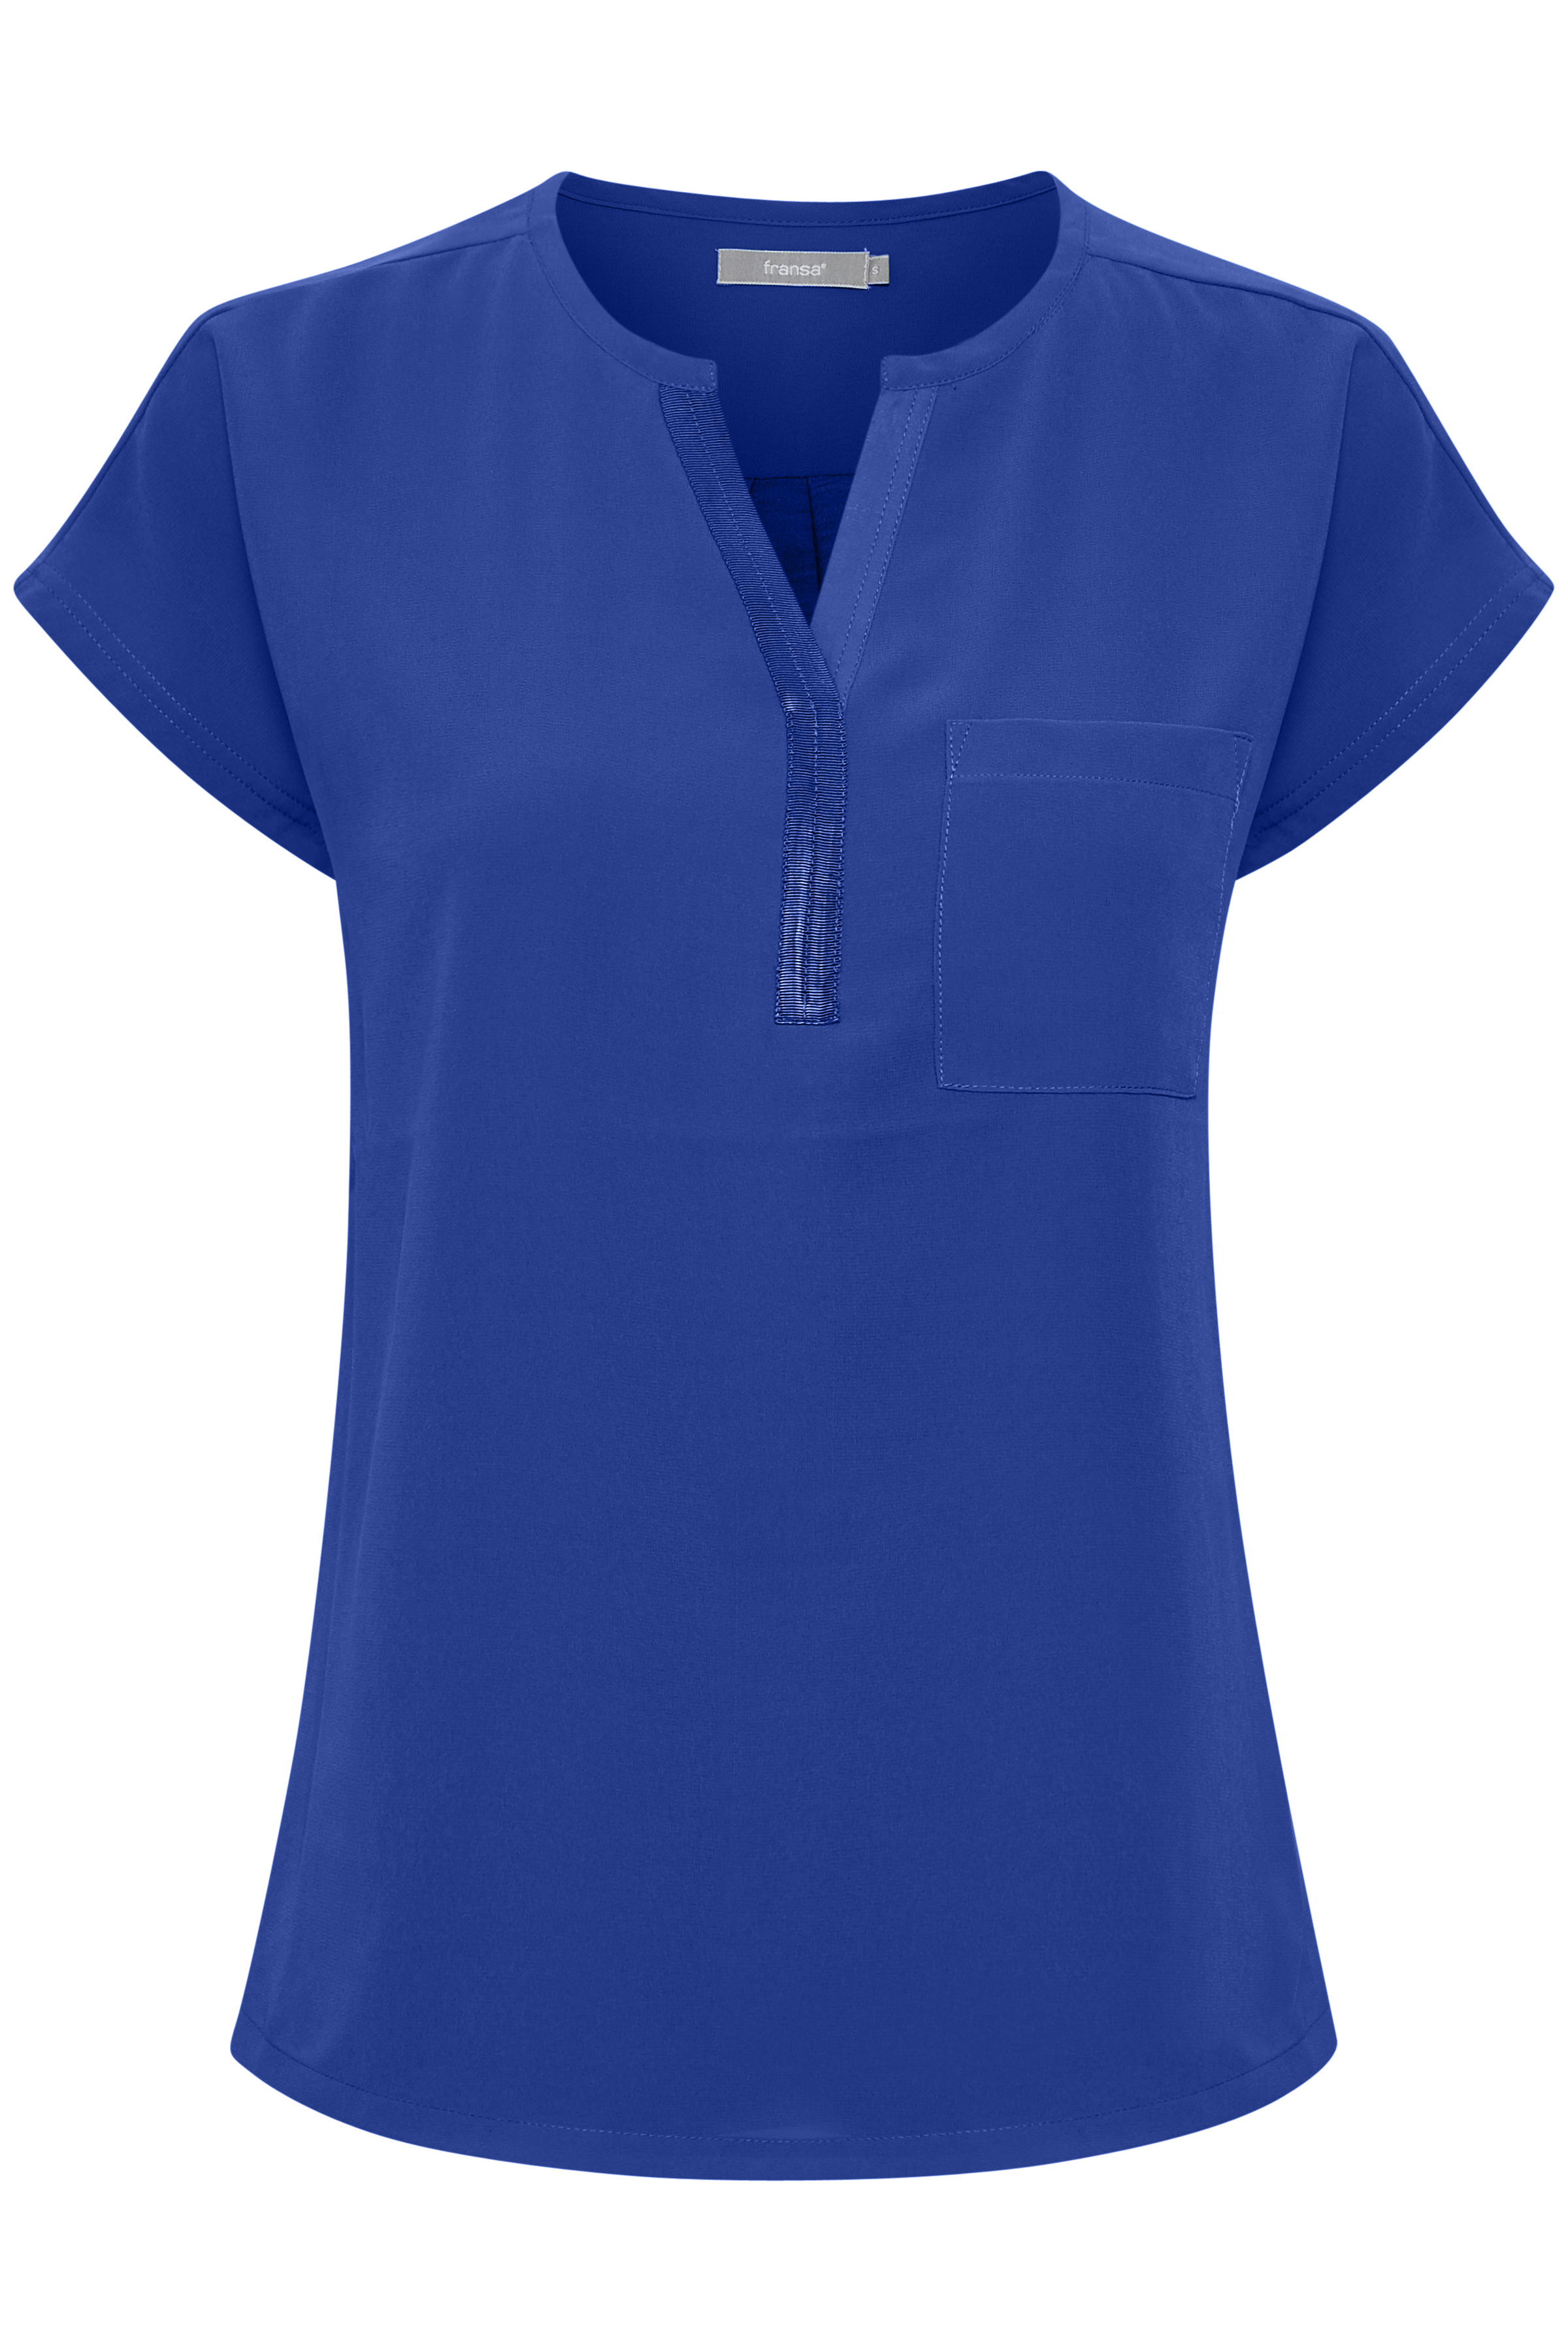 Blau Kurzarm-Bluse von Fransa – Shoppen Sie Blau Kurzarm-Bluse ab Gr. XS-XXL hier